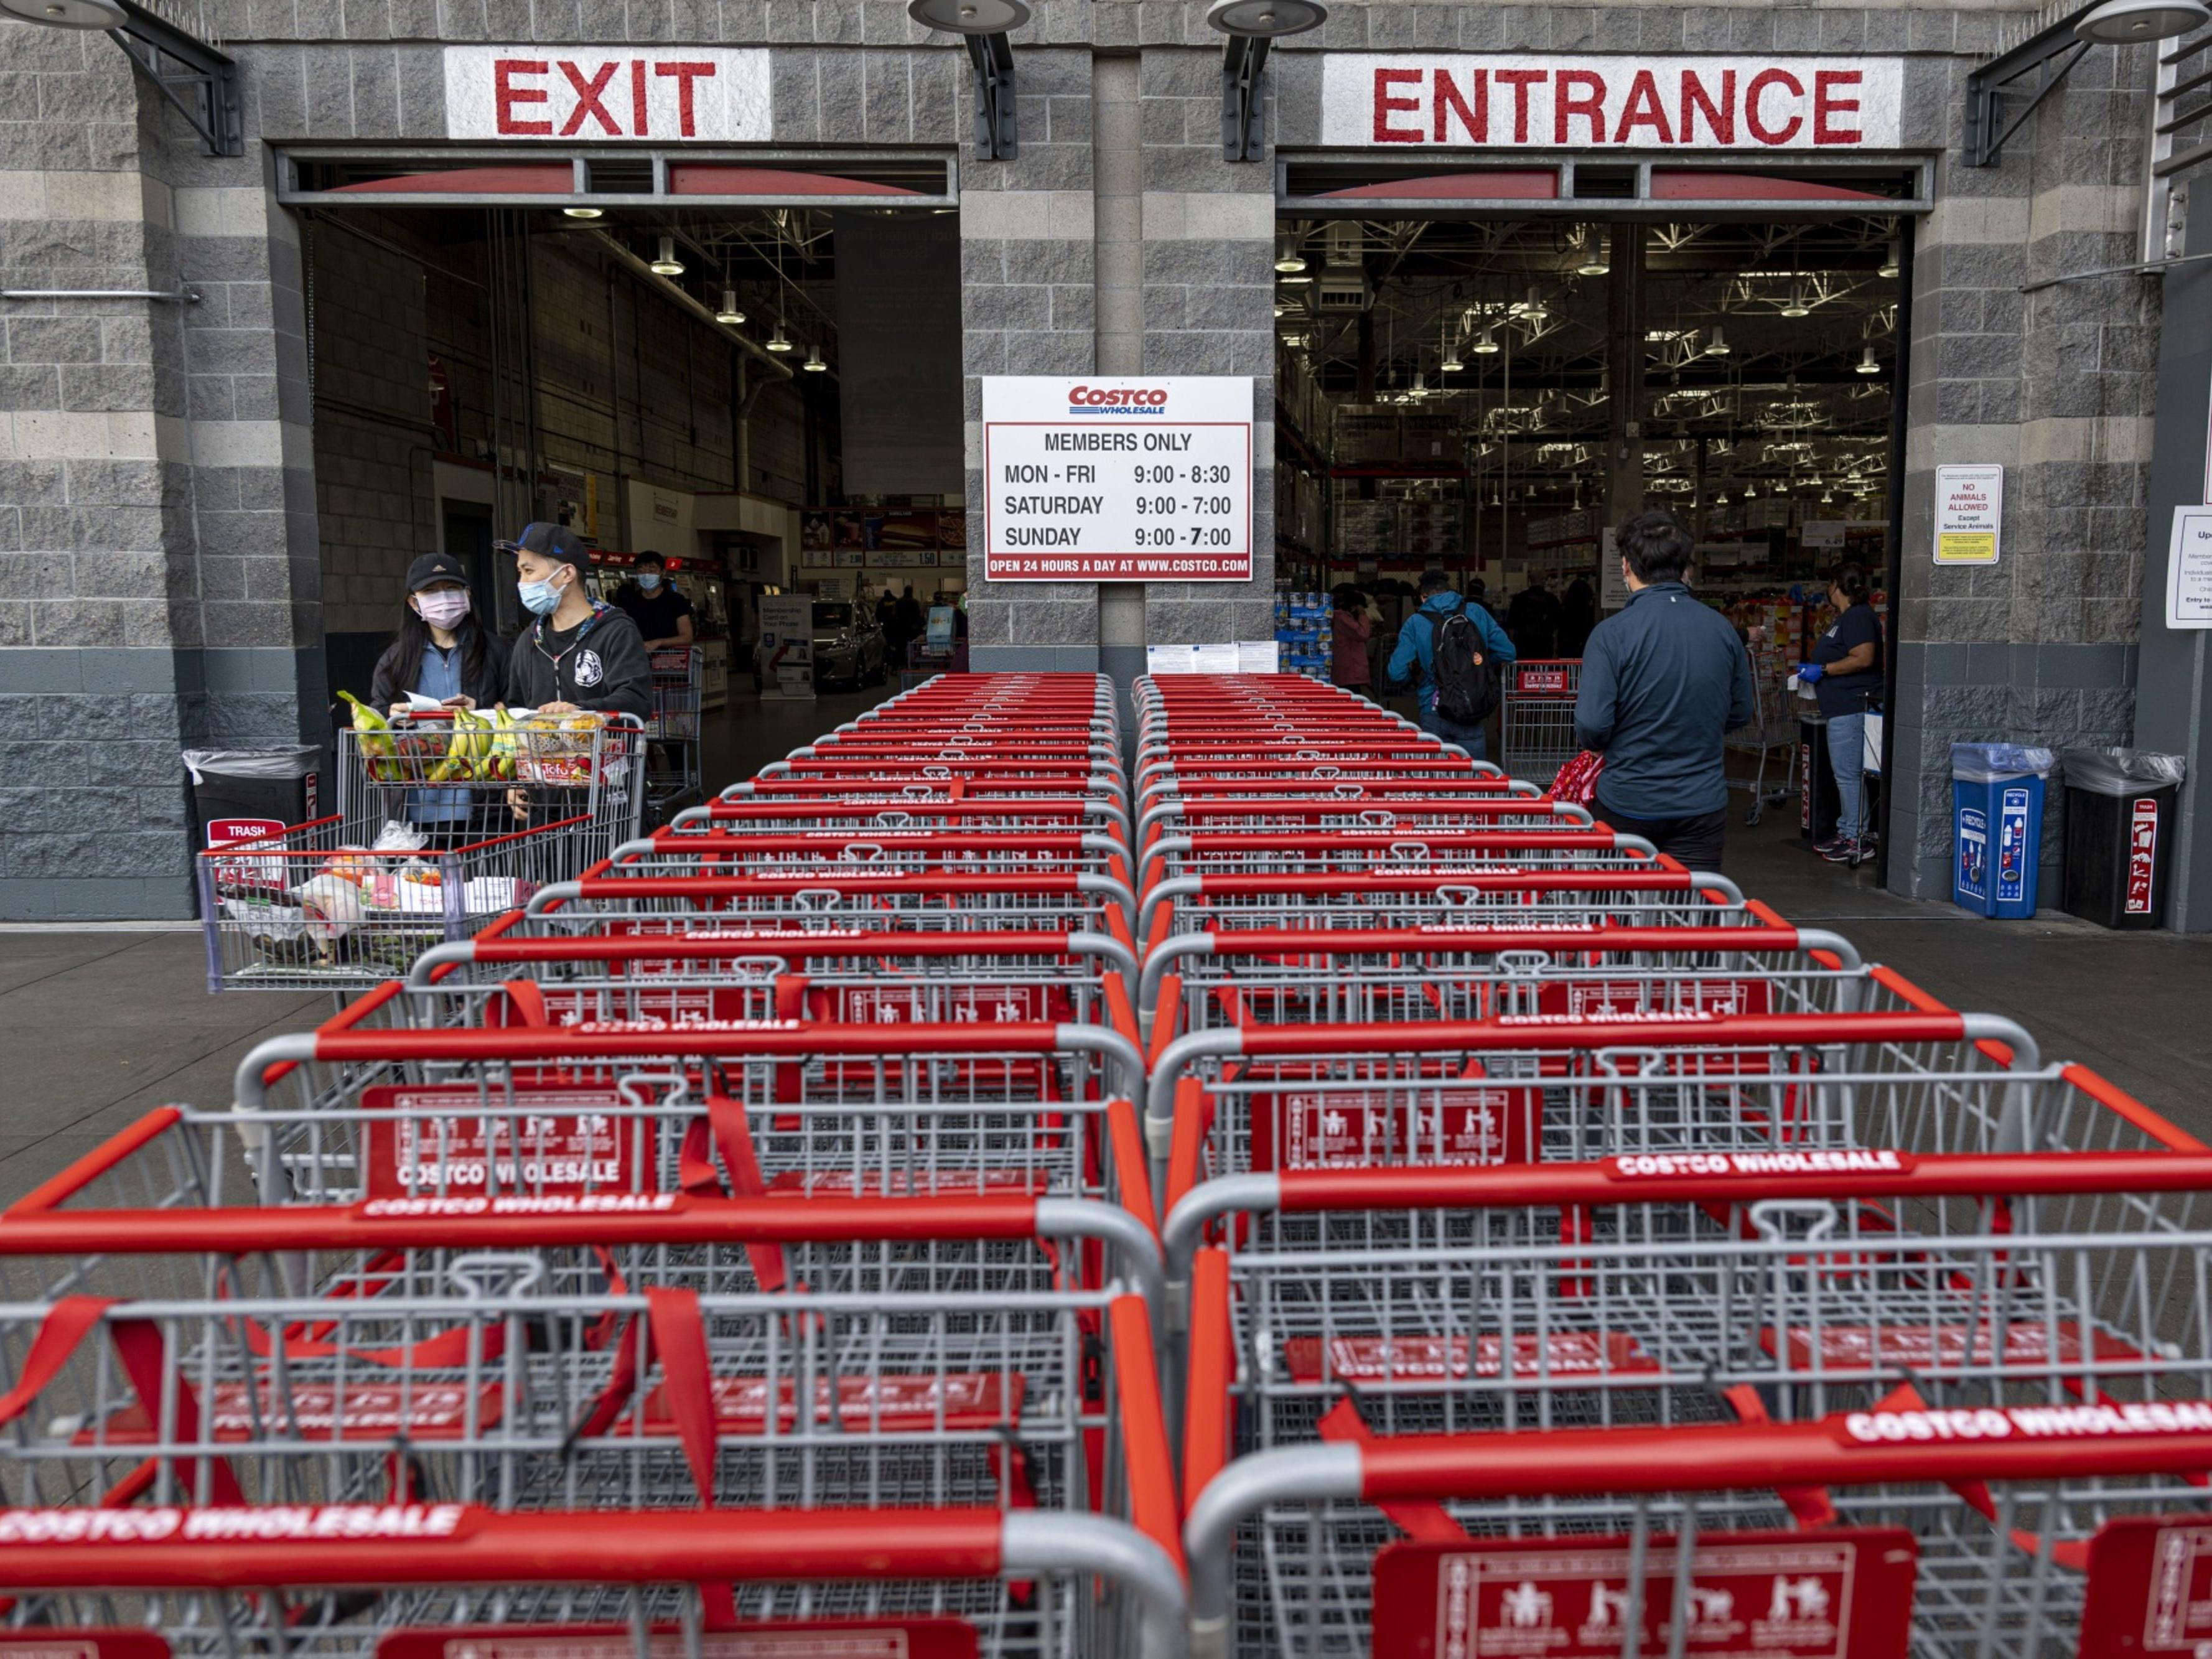 Costco shopping carts